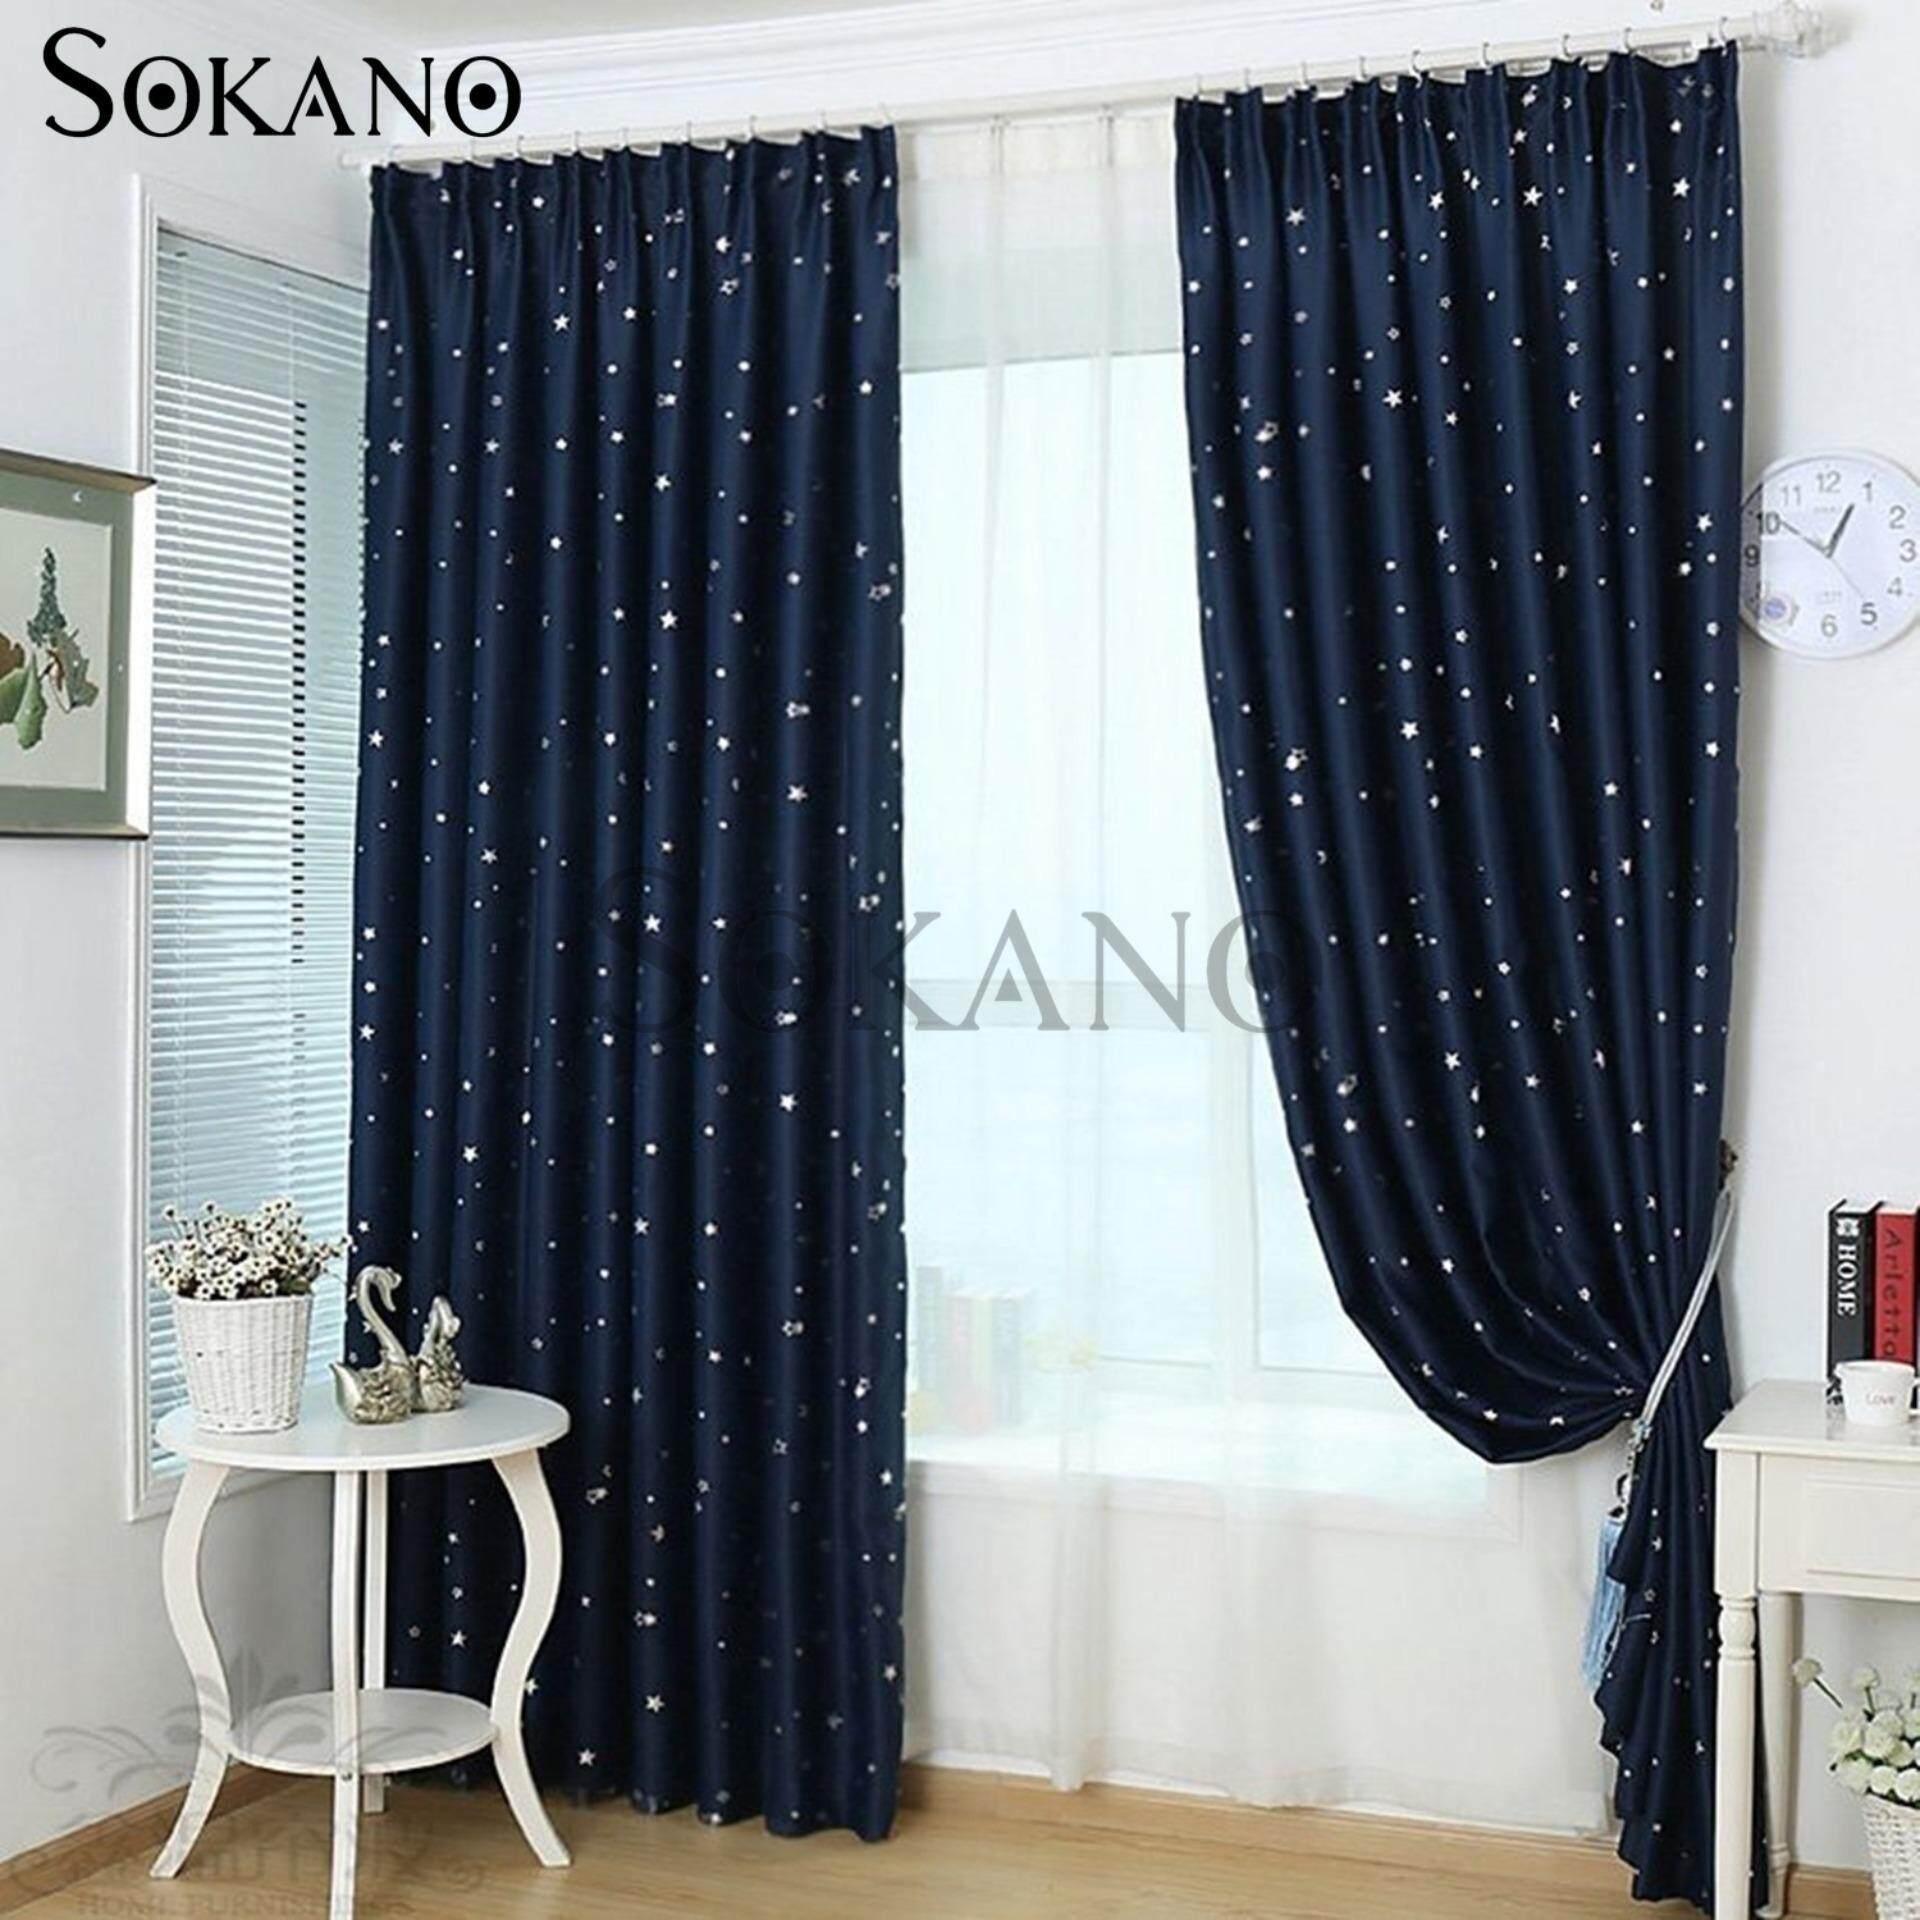 SOKANO CT020 Premium Blackout Curtain 1 Panel (200cm x 270cm)- Dark Blue Star Design